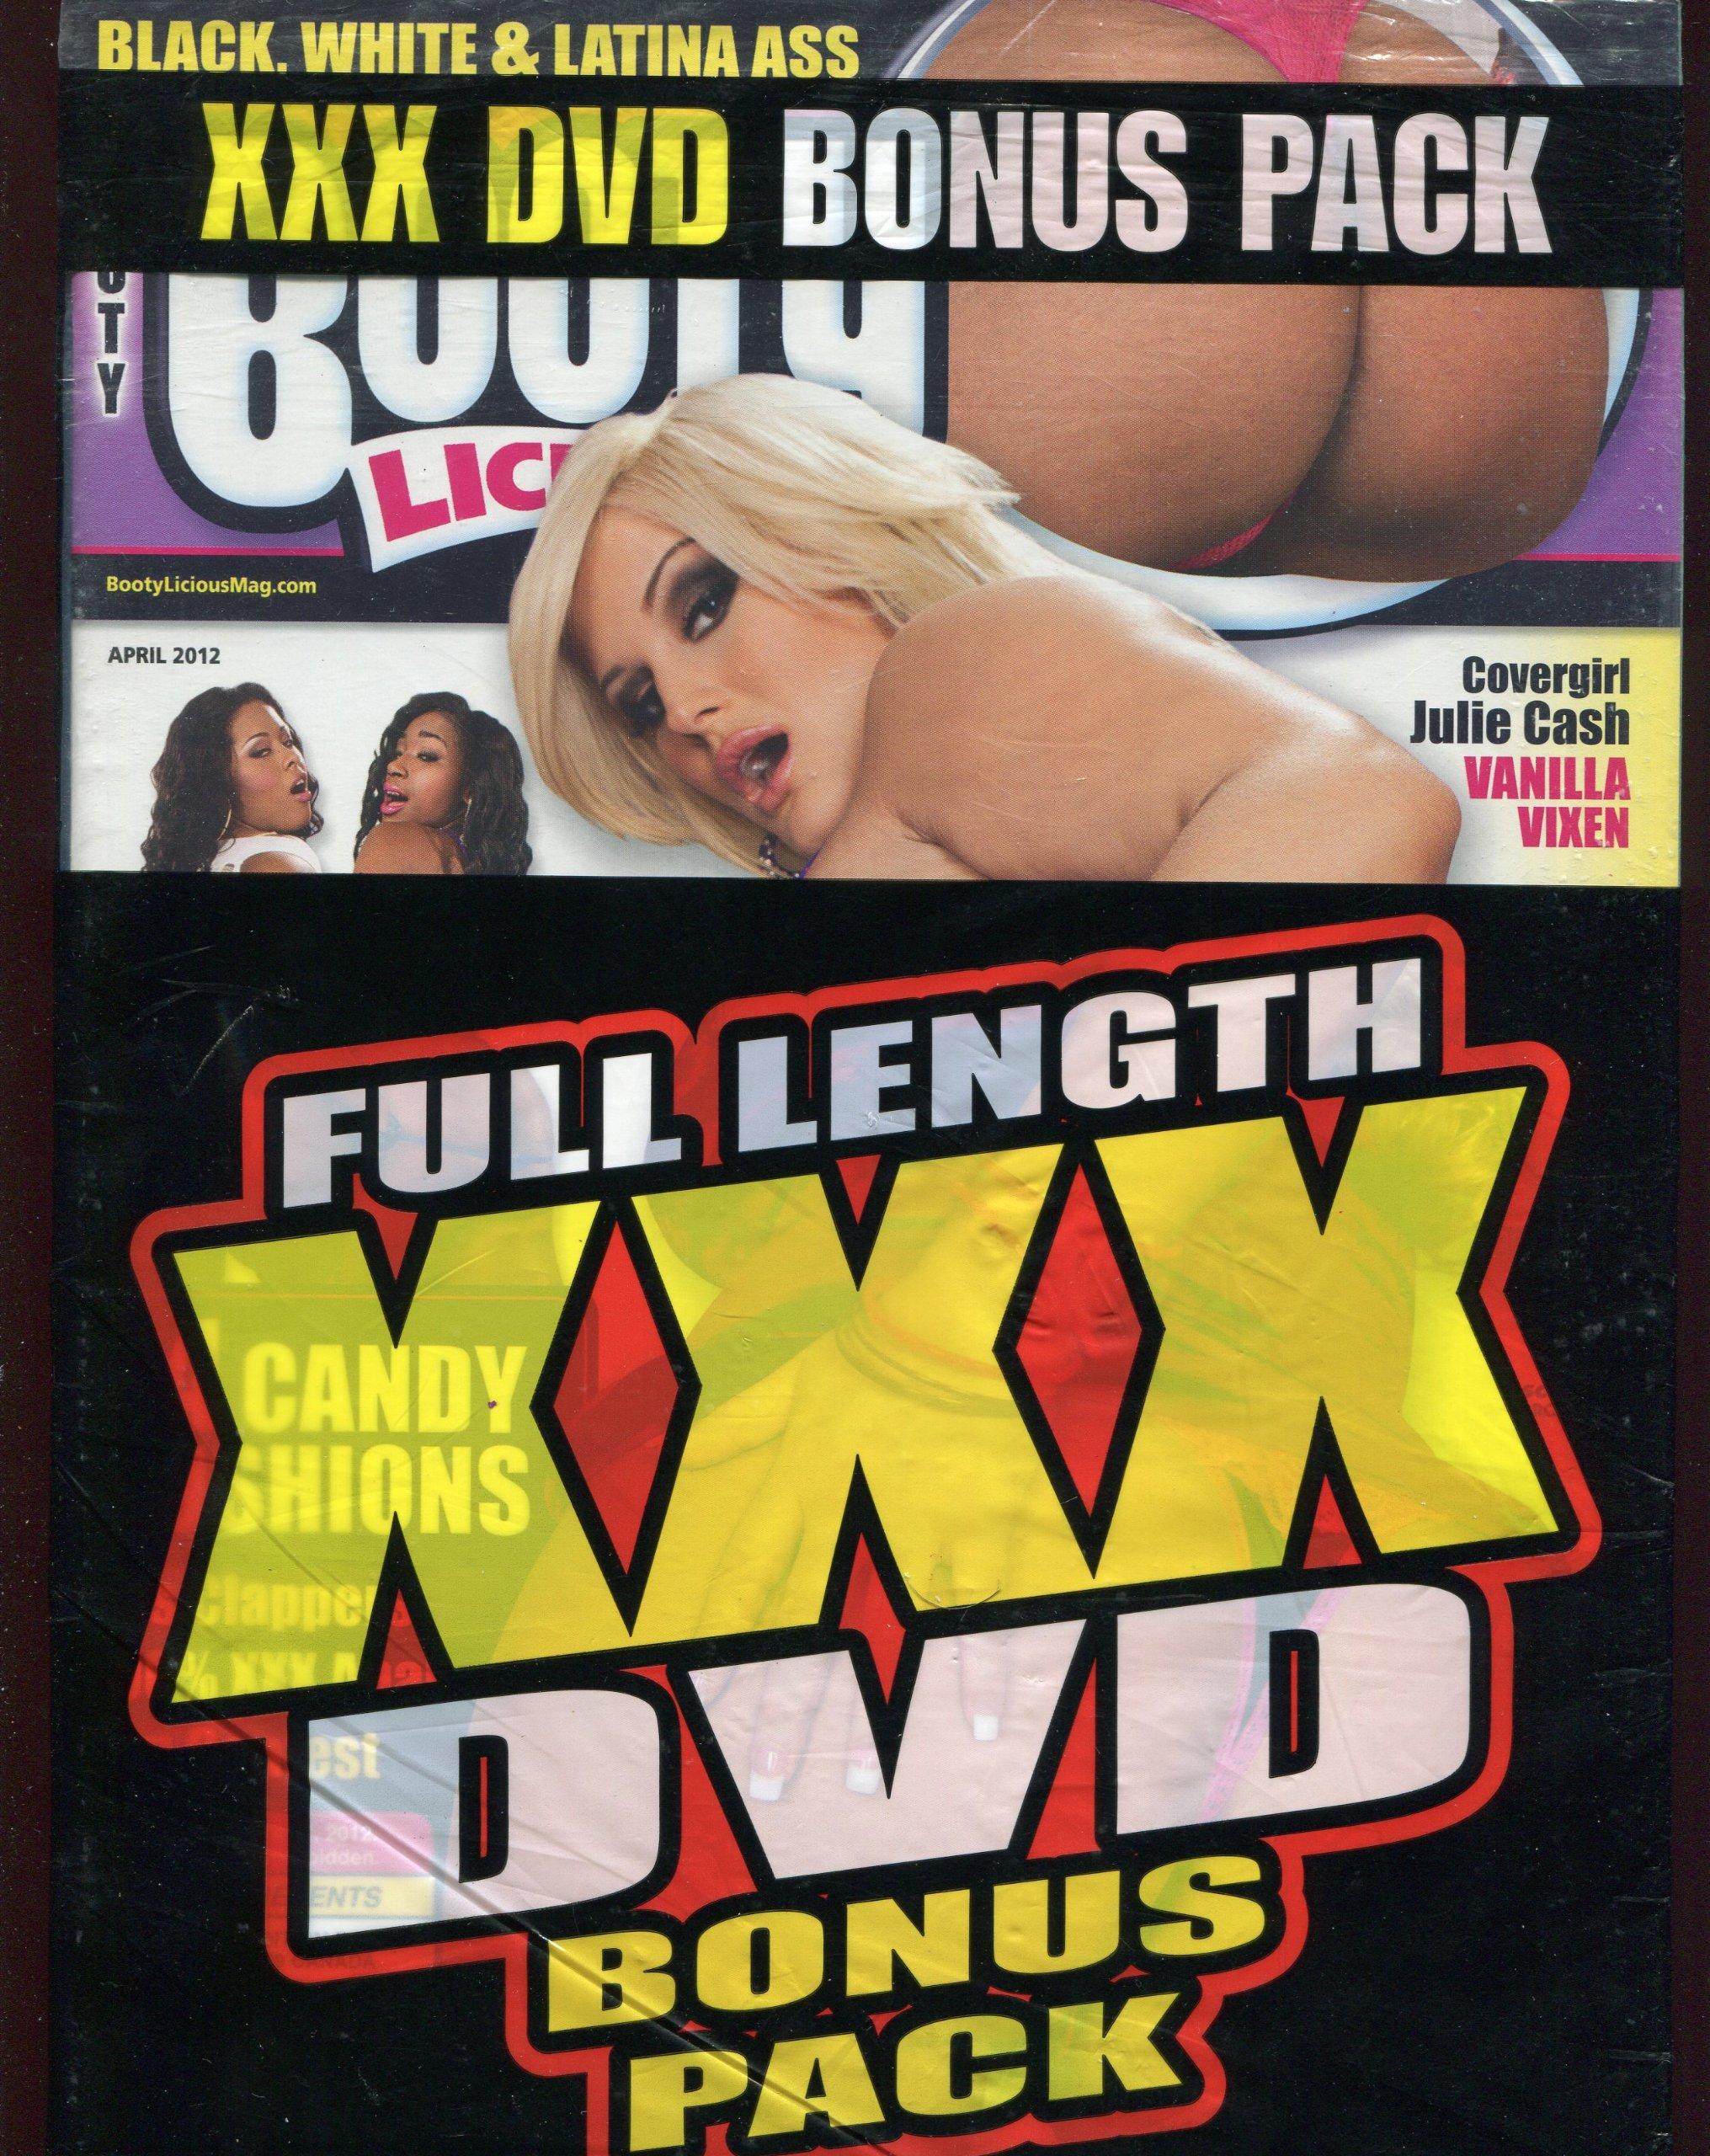 xxx Julie cash bootylicious